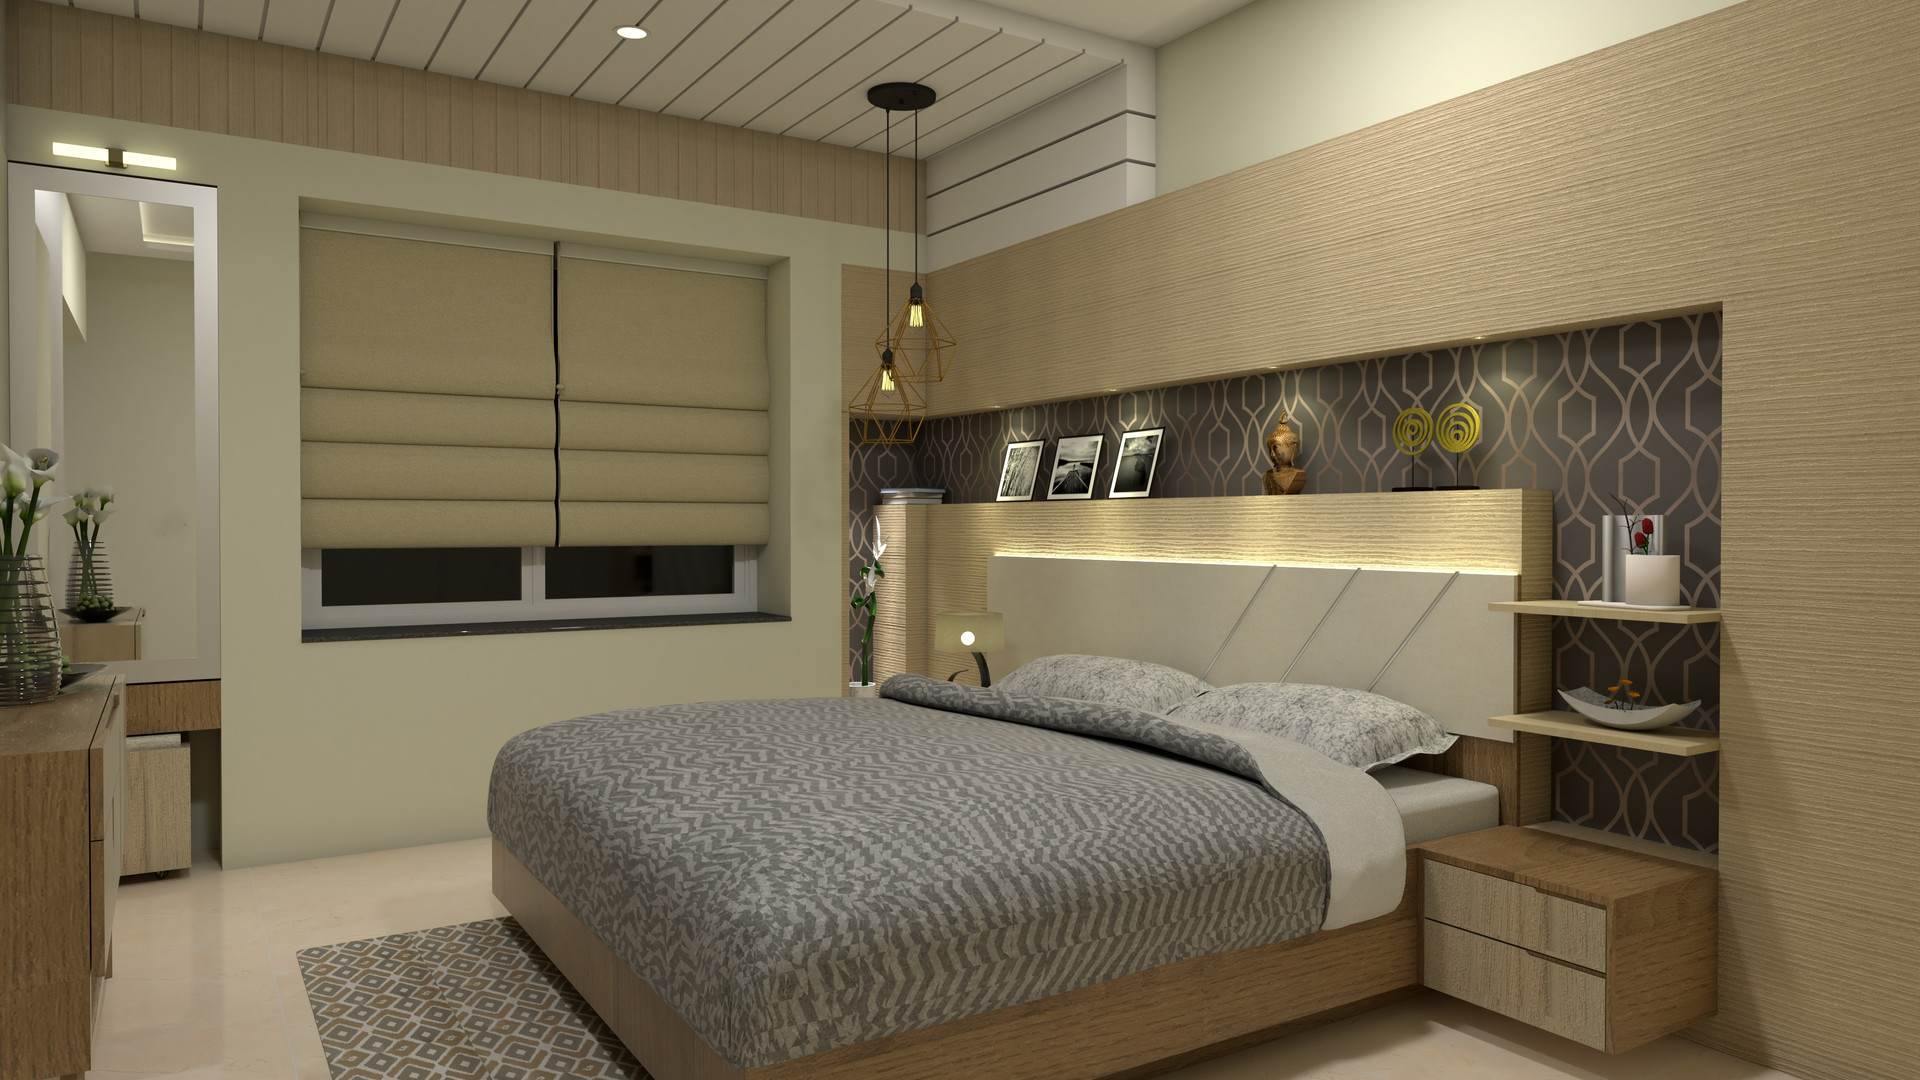 Luxurious 3BHK Home